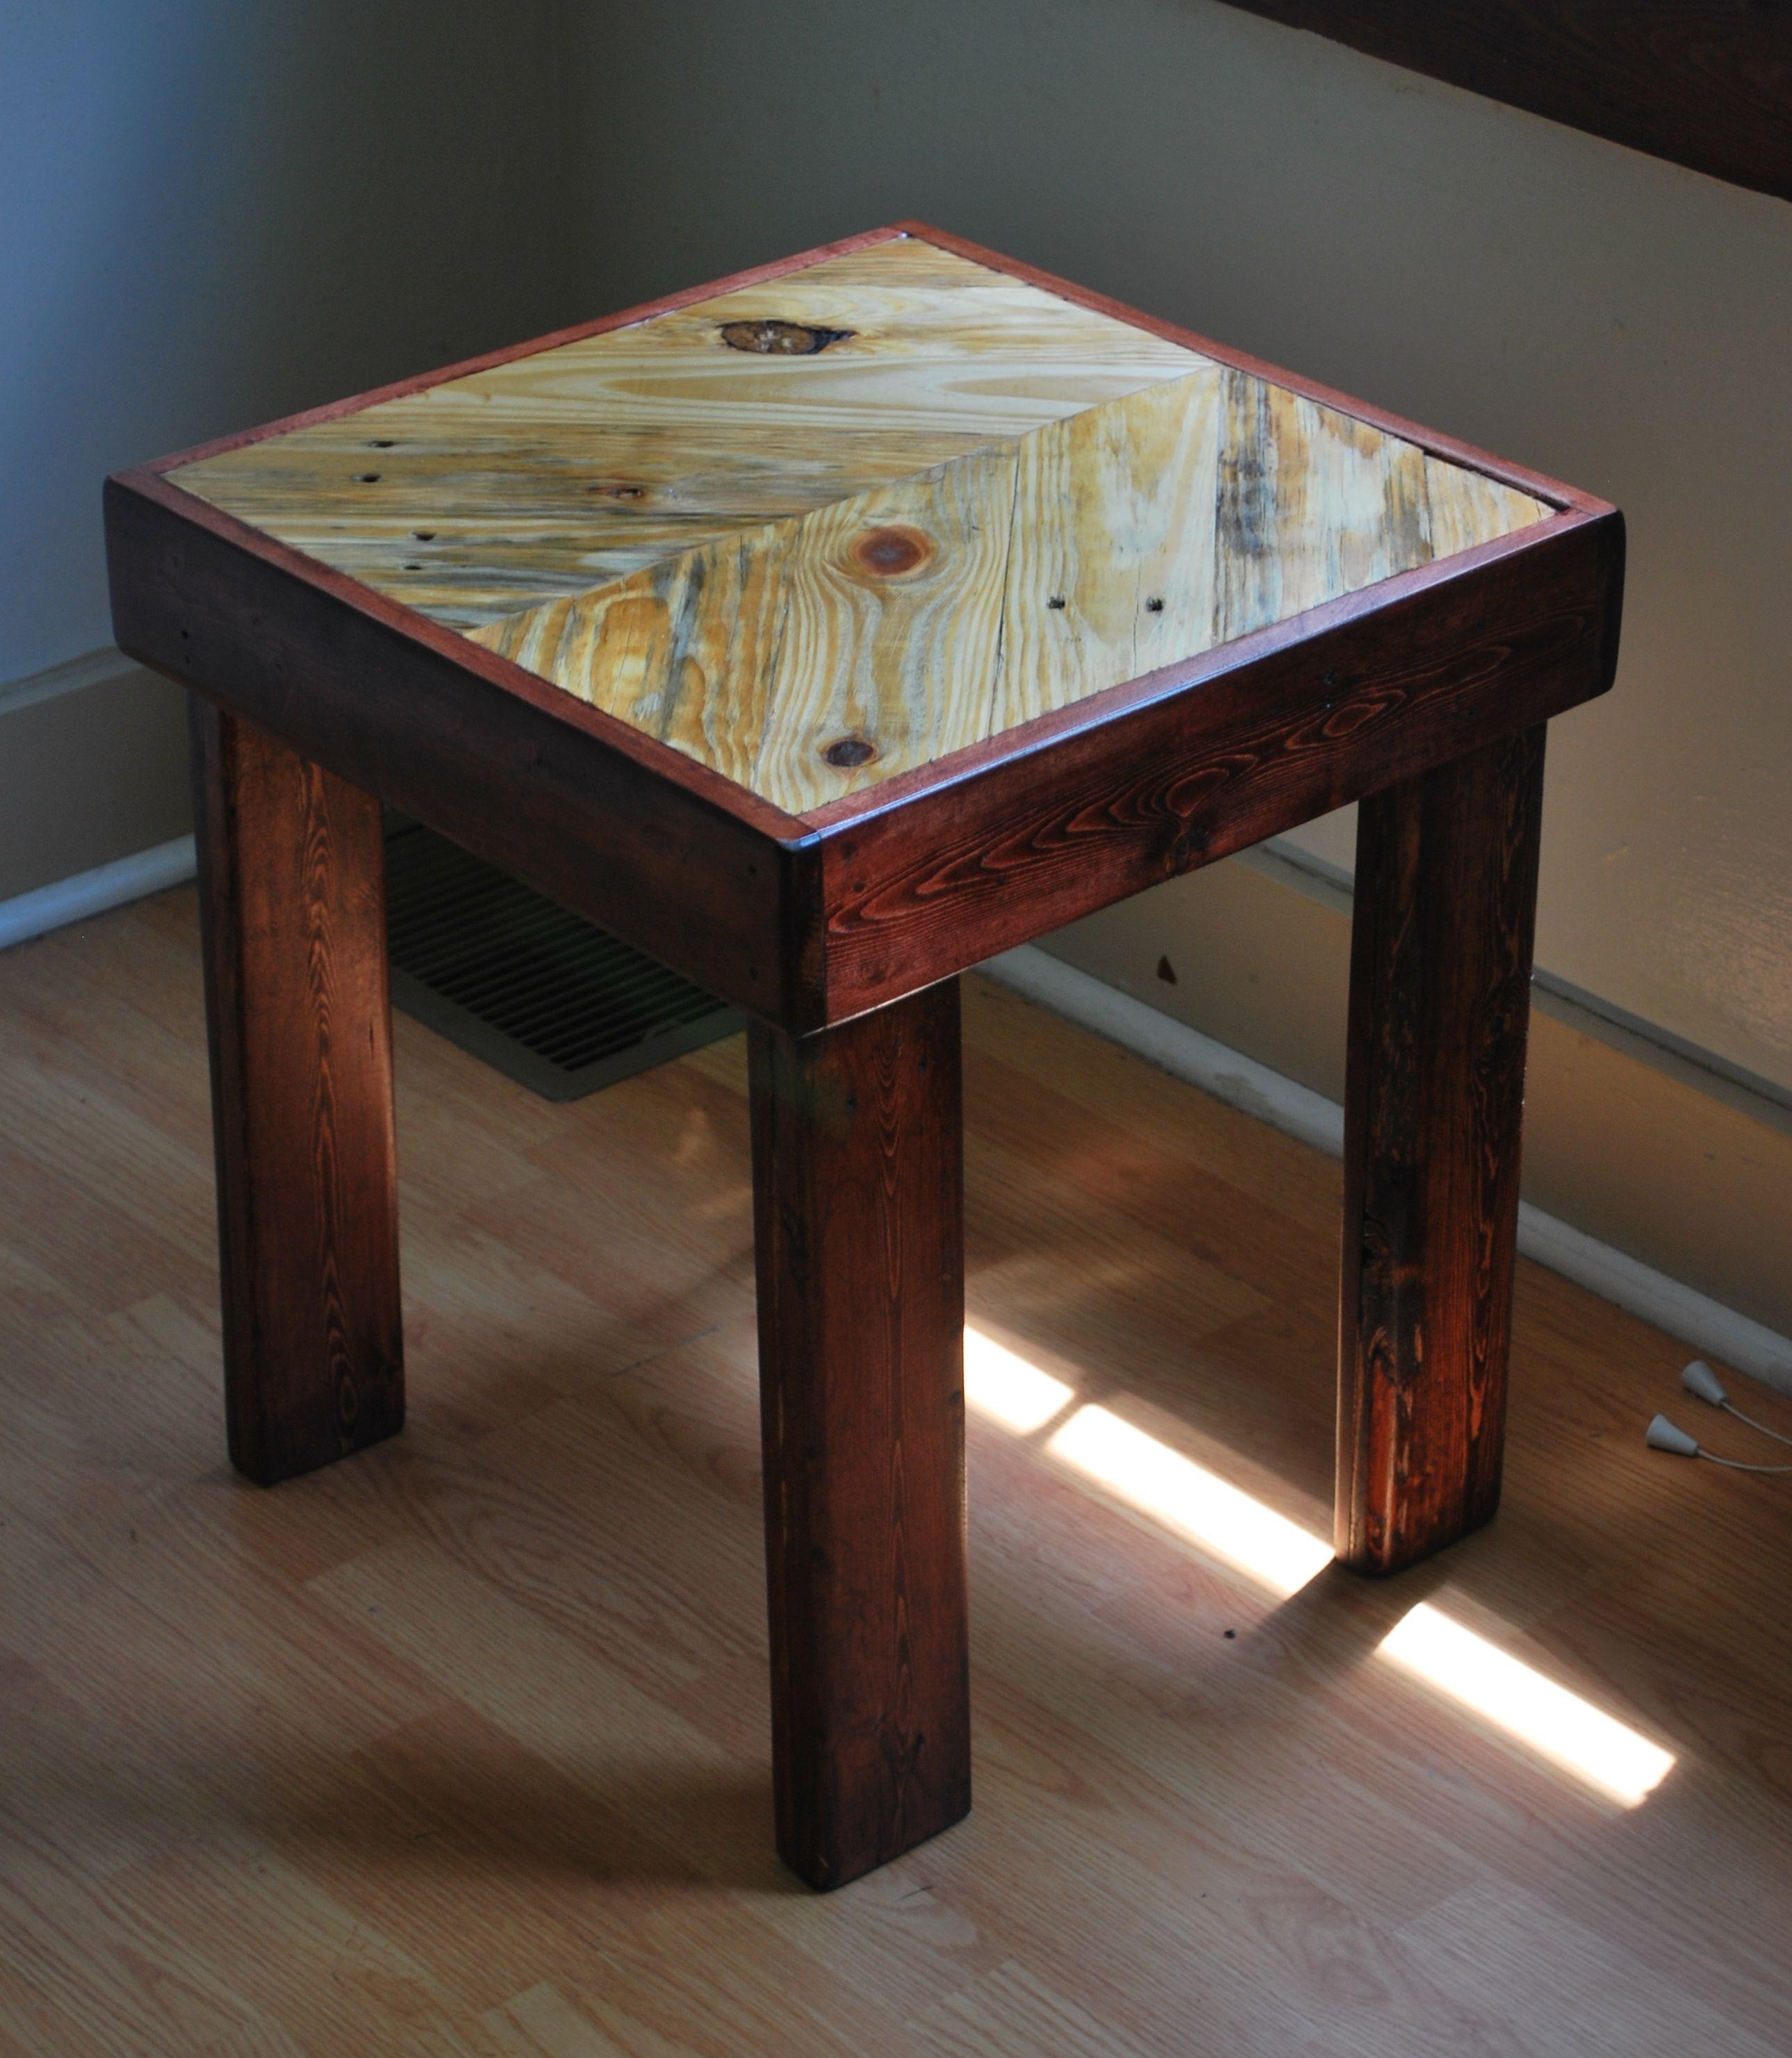 Chevron side table